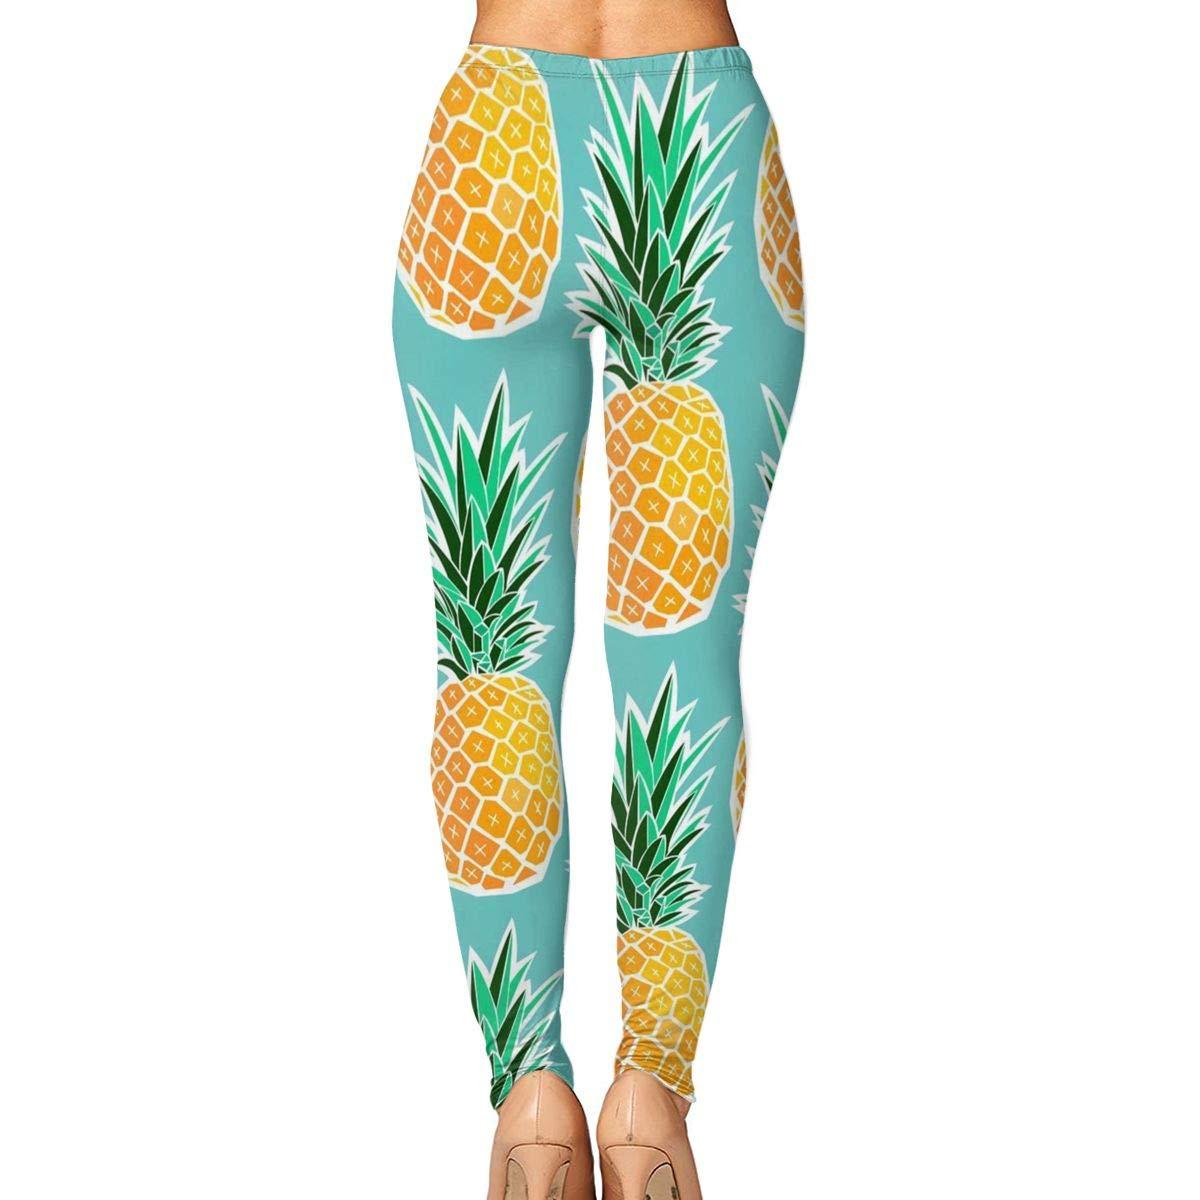 bb4e858b931d27 Amazon.com : HUIj Hawaiian Tropical Pineapple Women¡¯s Yoga Pants - Workout  Running Tummy Control Stretch Power Flex Stylish Long/Capris Leggings :  Sports & ...